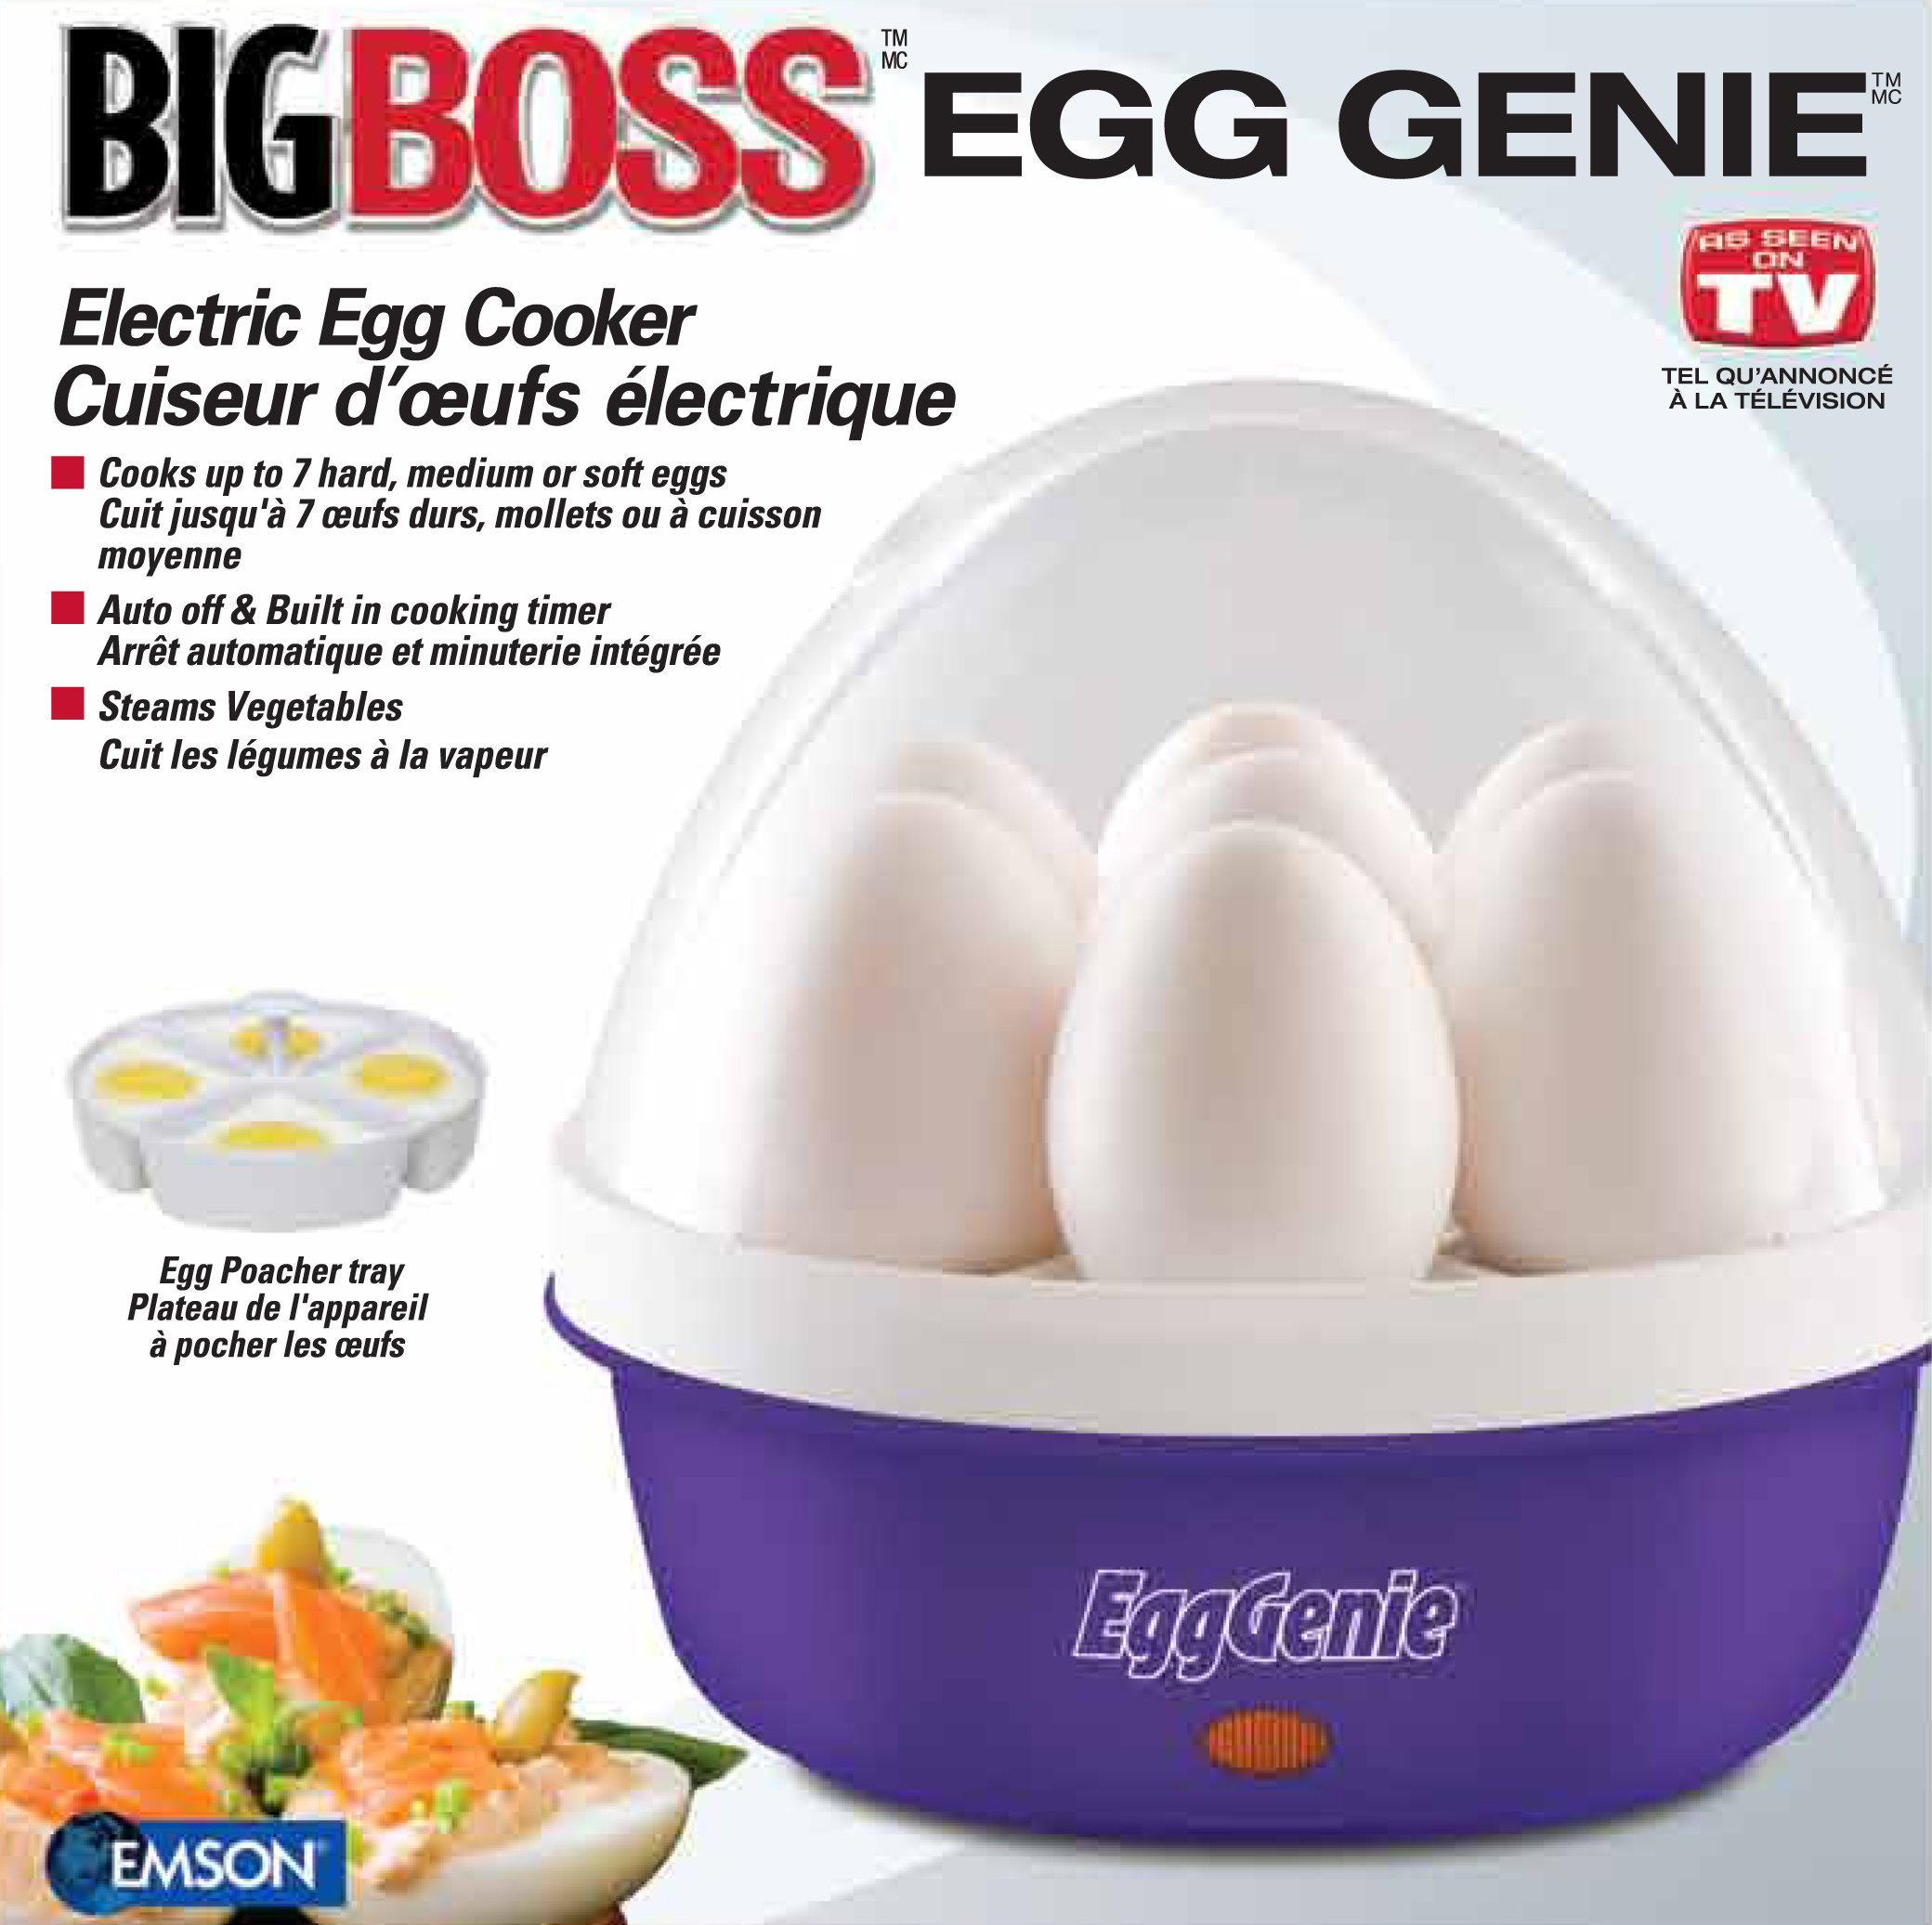 Big Boss BBEggGeniePR 8864 Genie Electric Egg Cooker, Purple, 1 by Big Boss (Image #1)